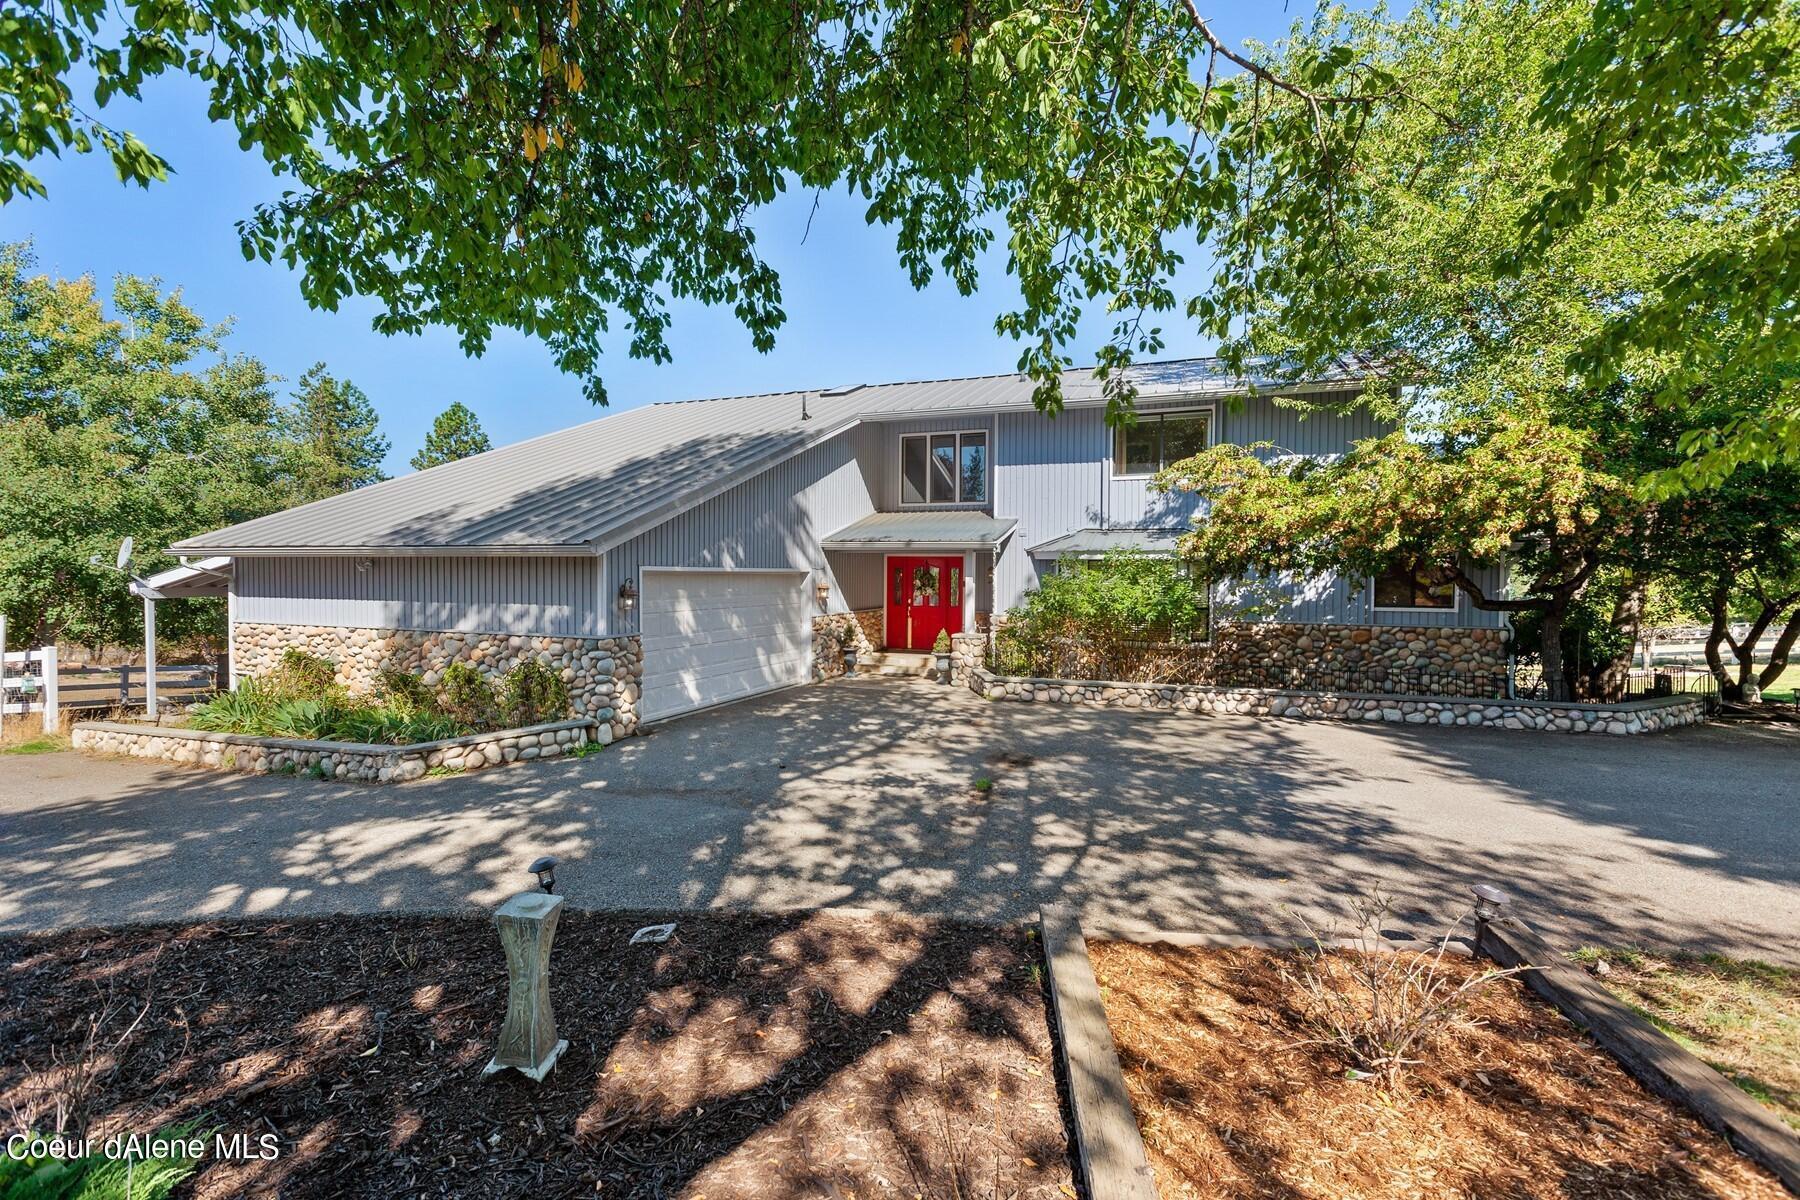 photo of 2938 E Murphy Rd Coeur d'Alene Idaho 83814